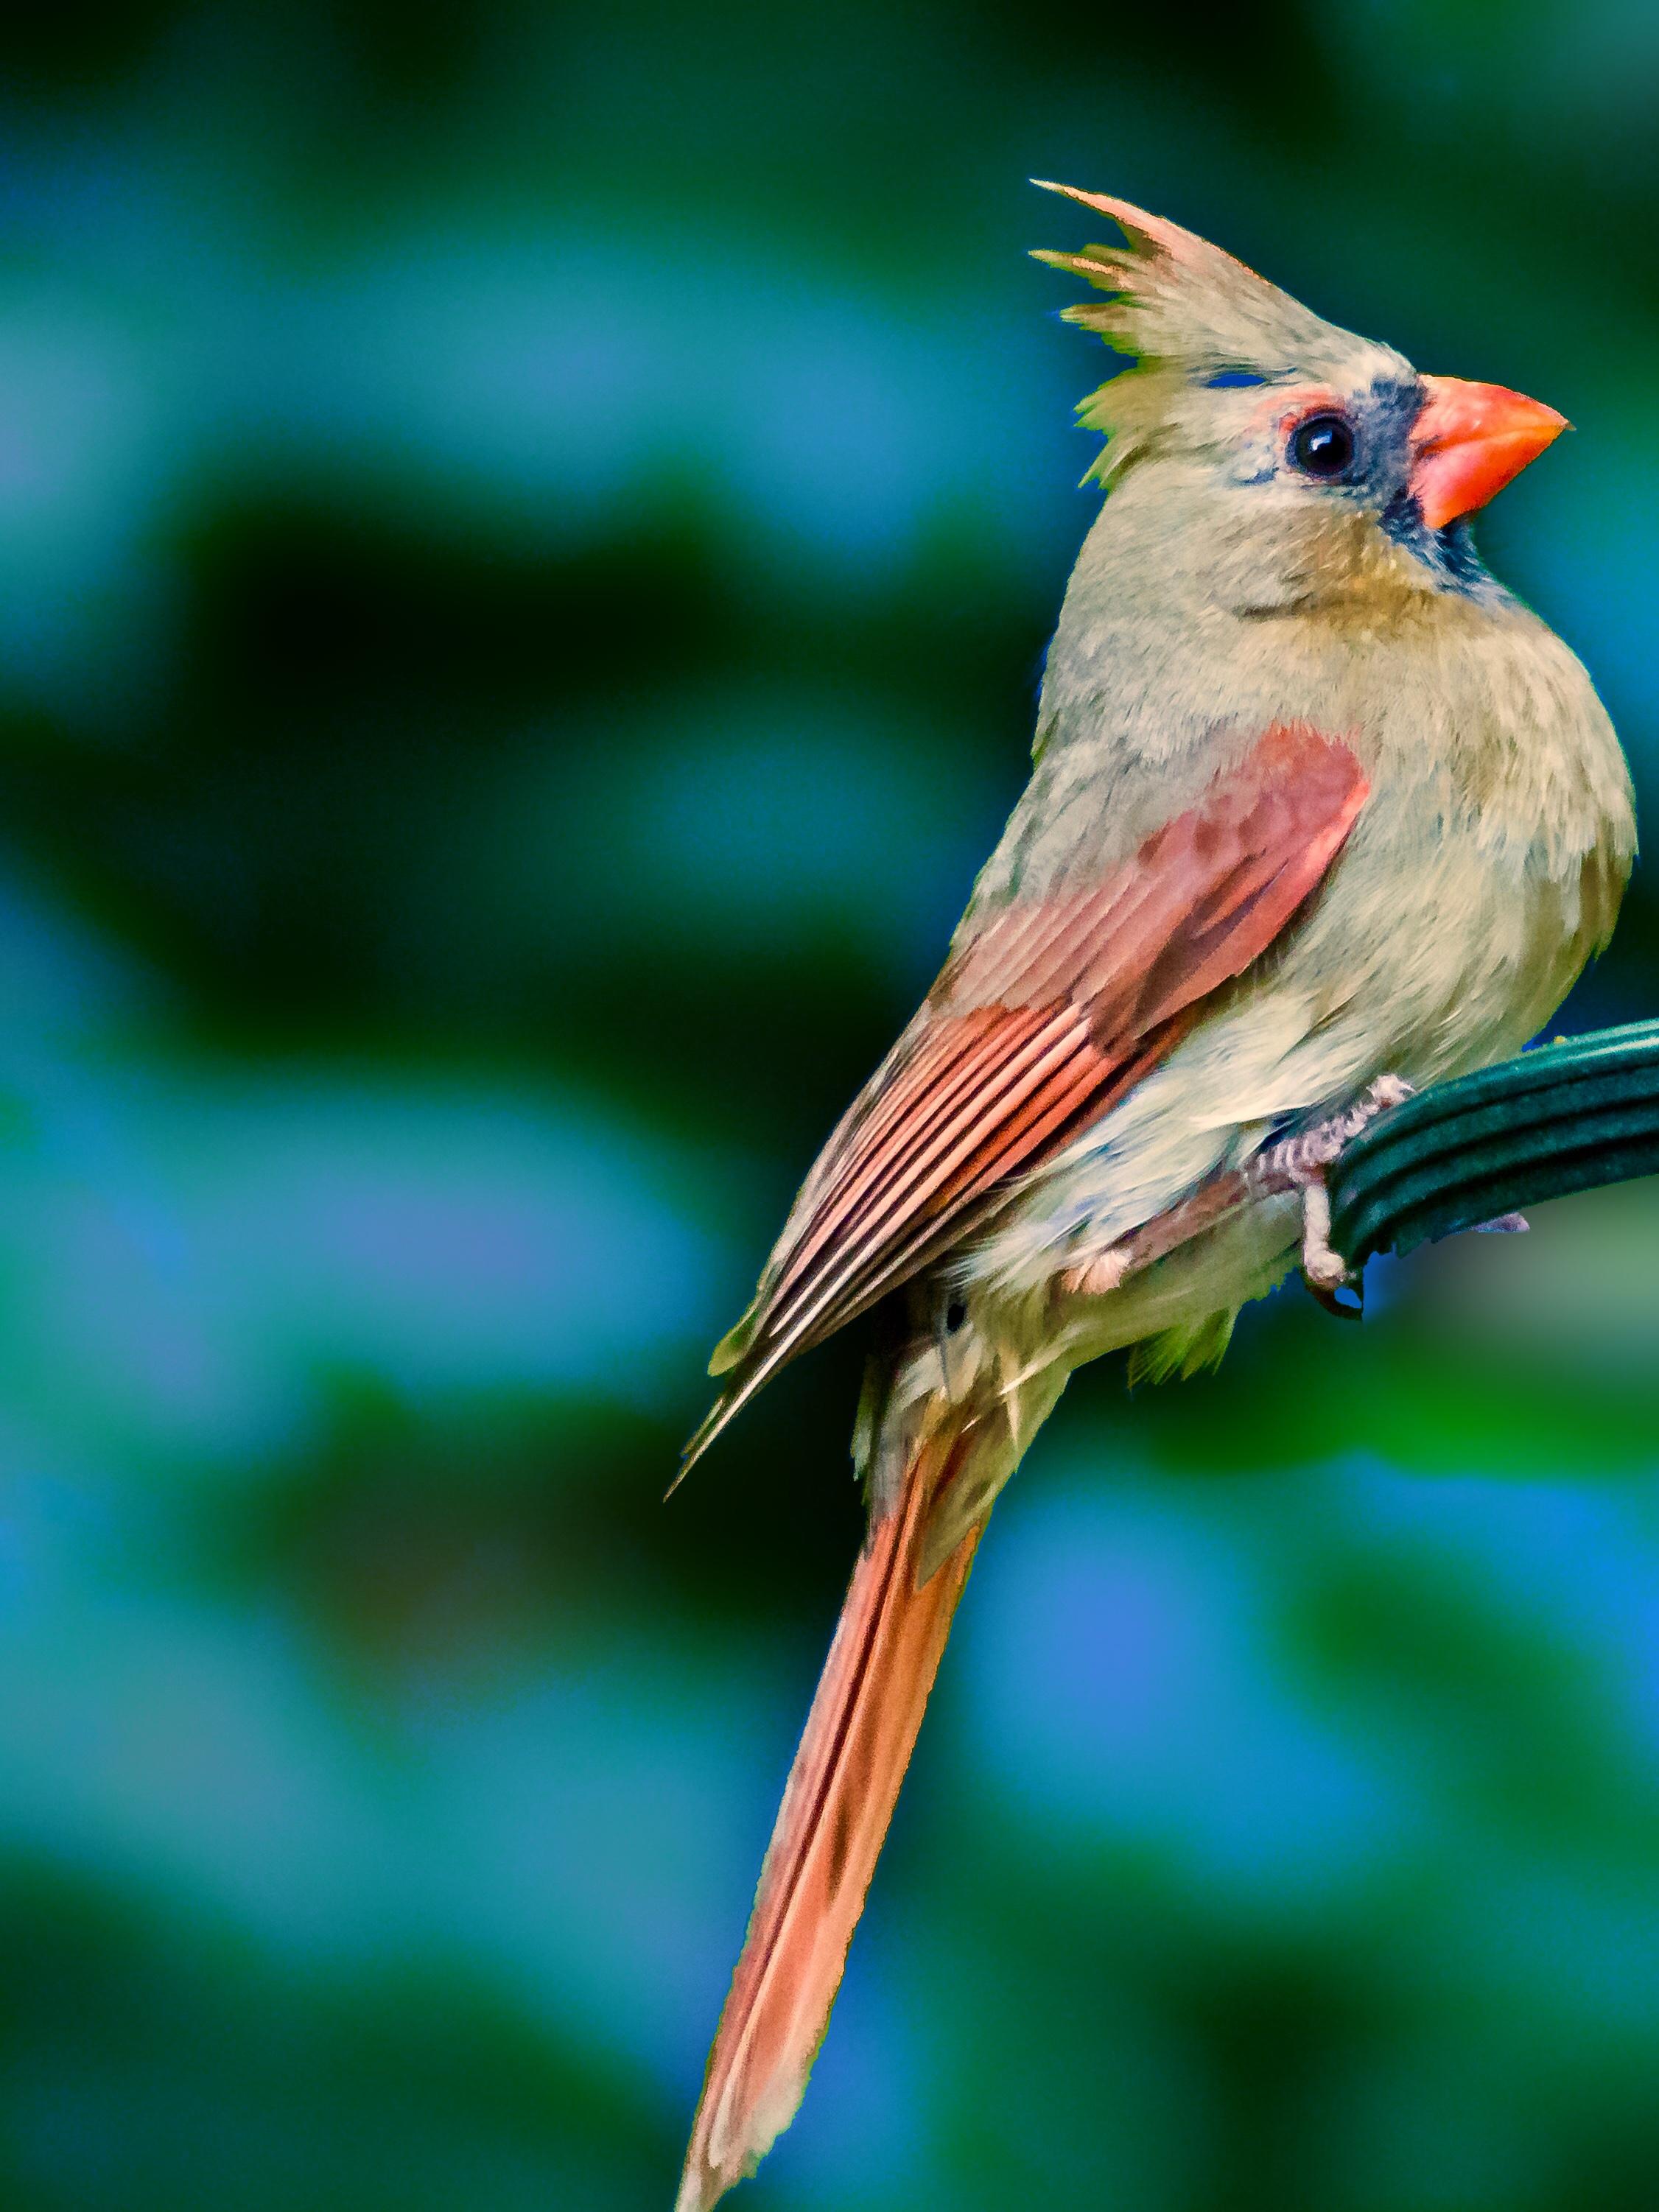 Female Cardinal in Profile